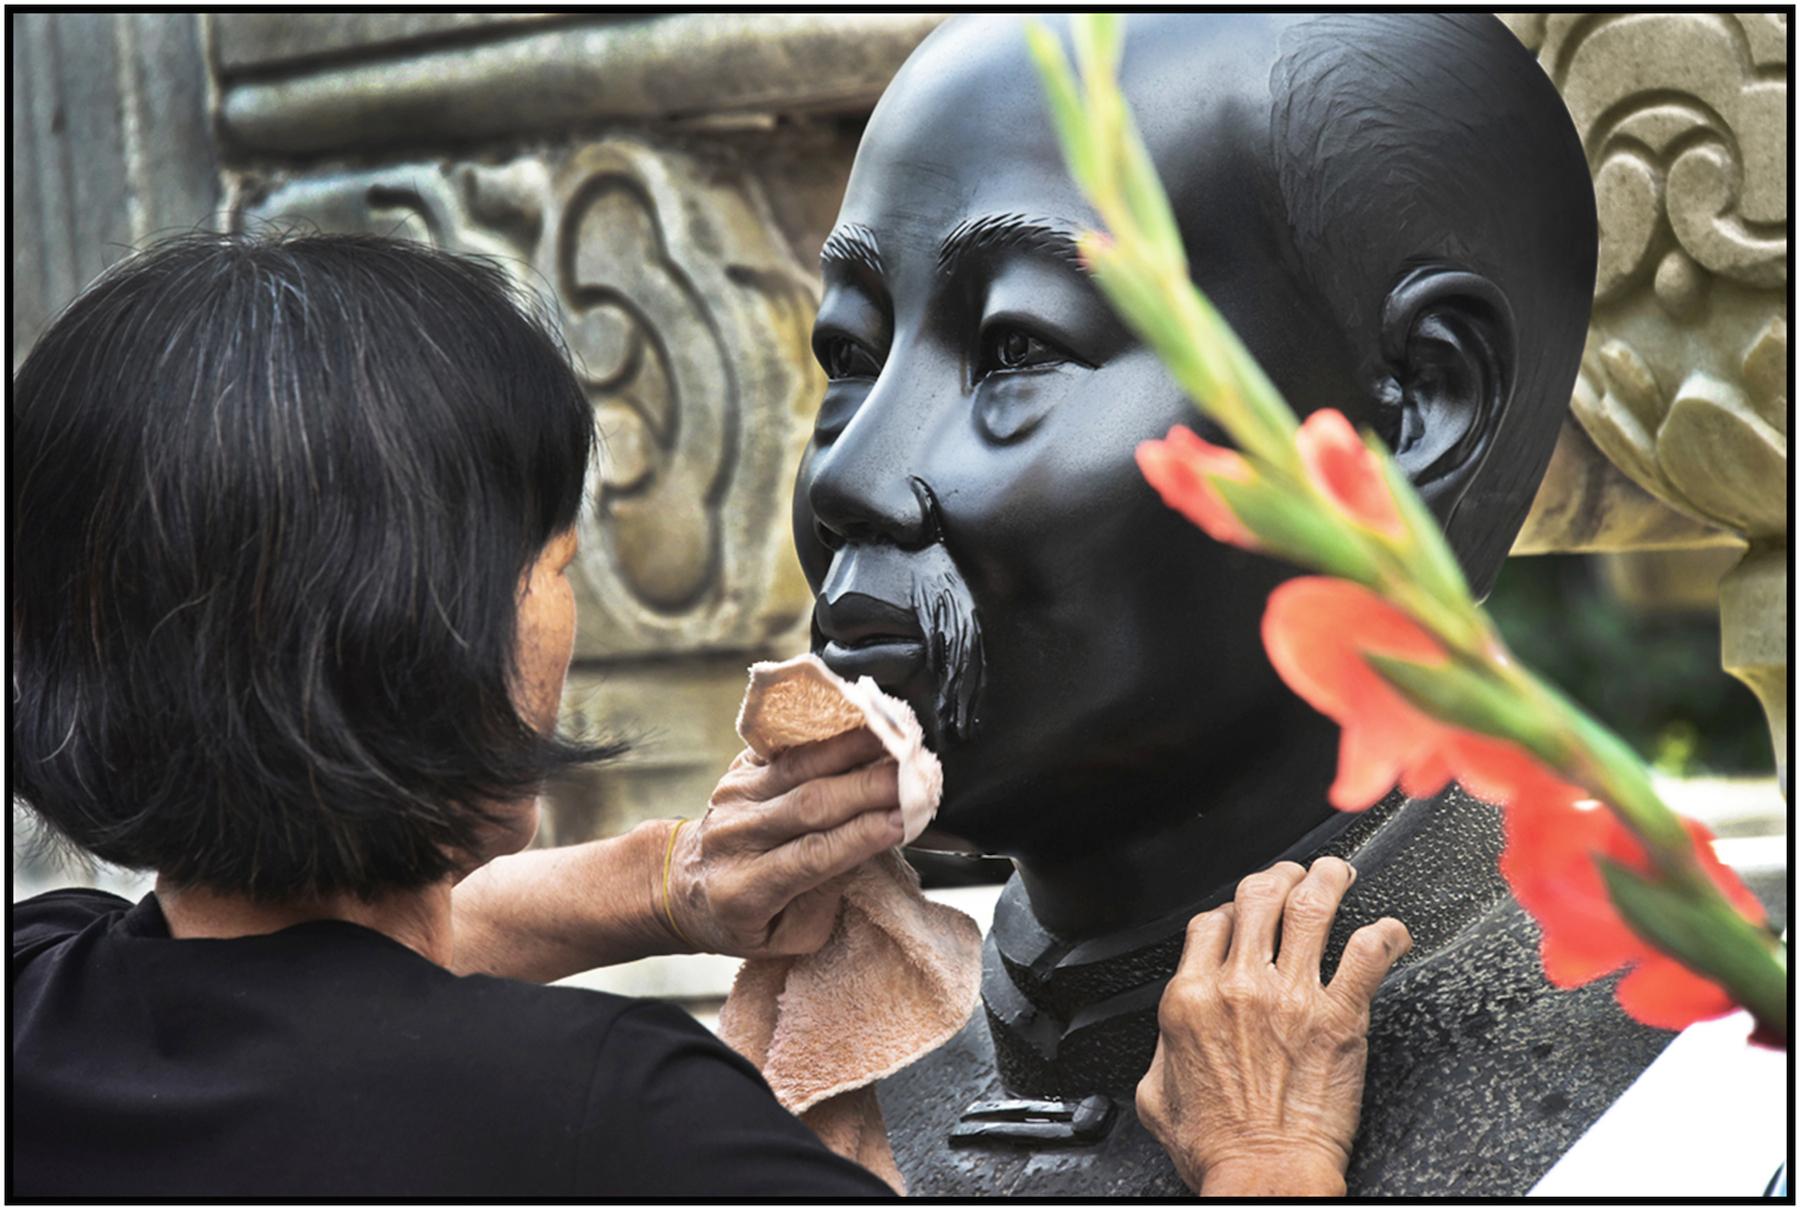 Ho Chi Minh sculpture in central courtyard of Binh Tay Market, Cholon, Saigon /HCMC, Dec 2015.